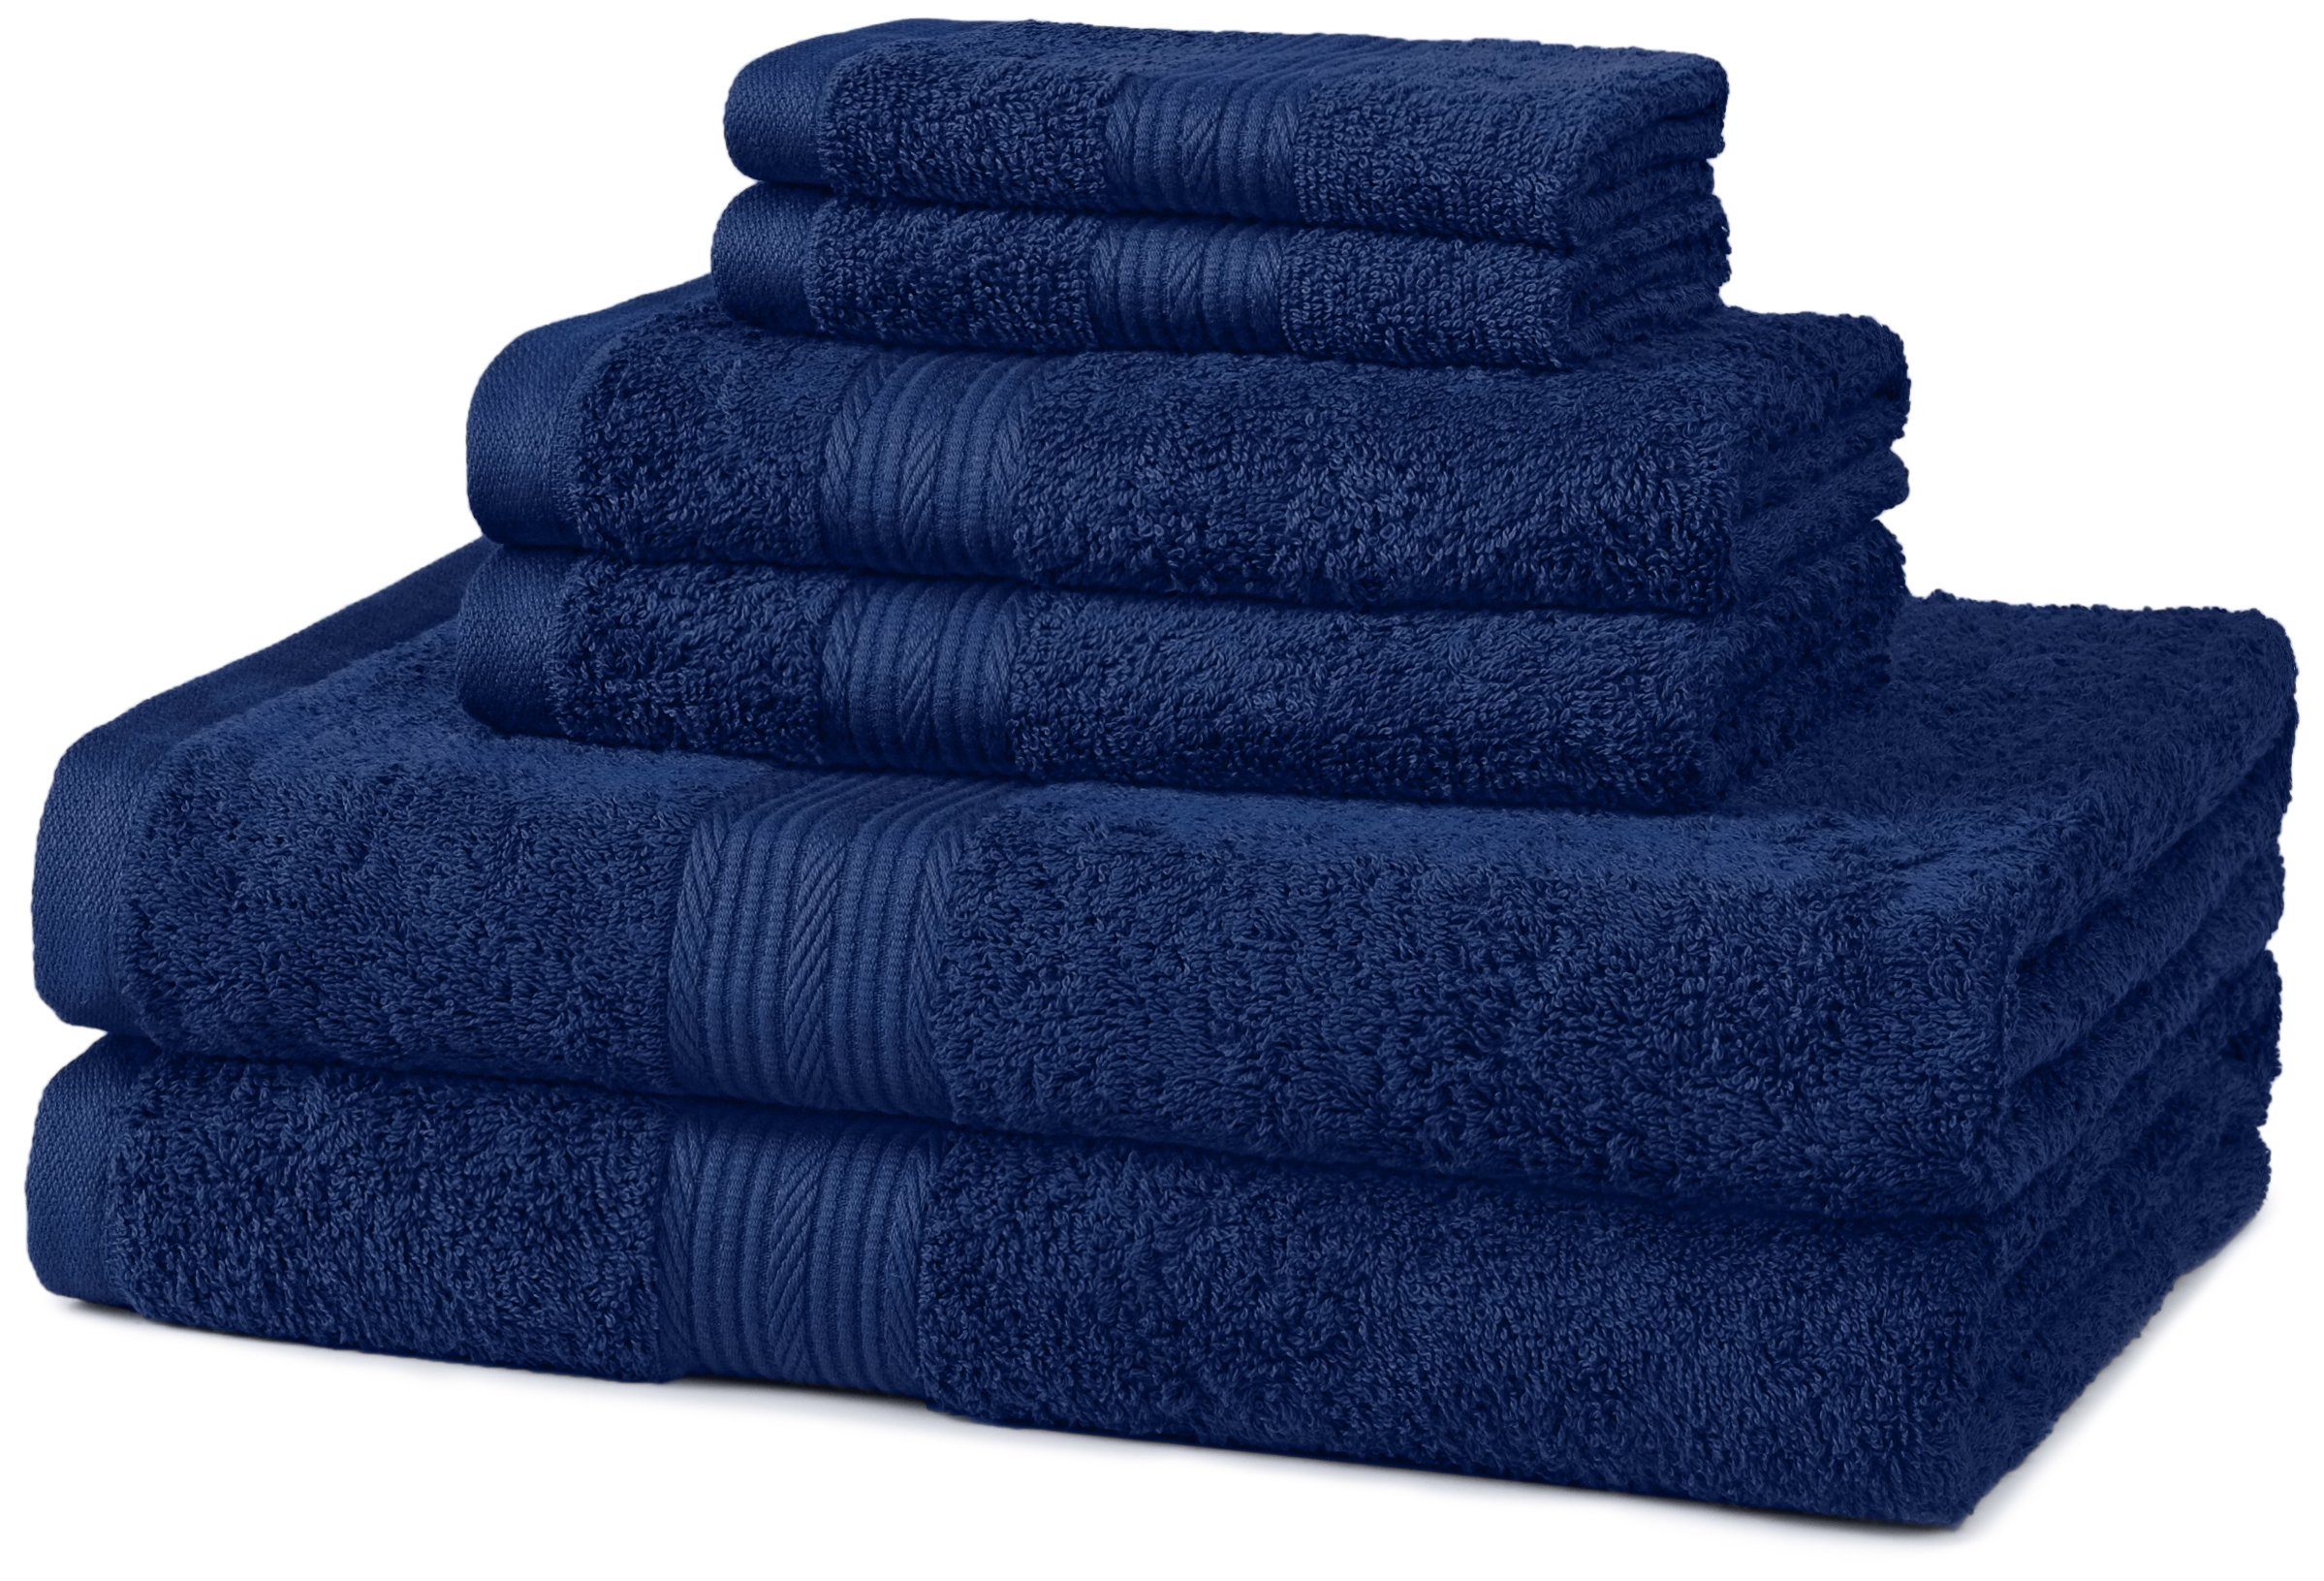 AmazonBasics 6-Piece Fade-Resistant Bath Towel Set - Navy Blue by AmazonBasics